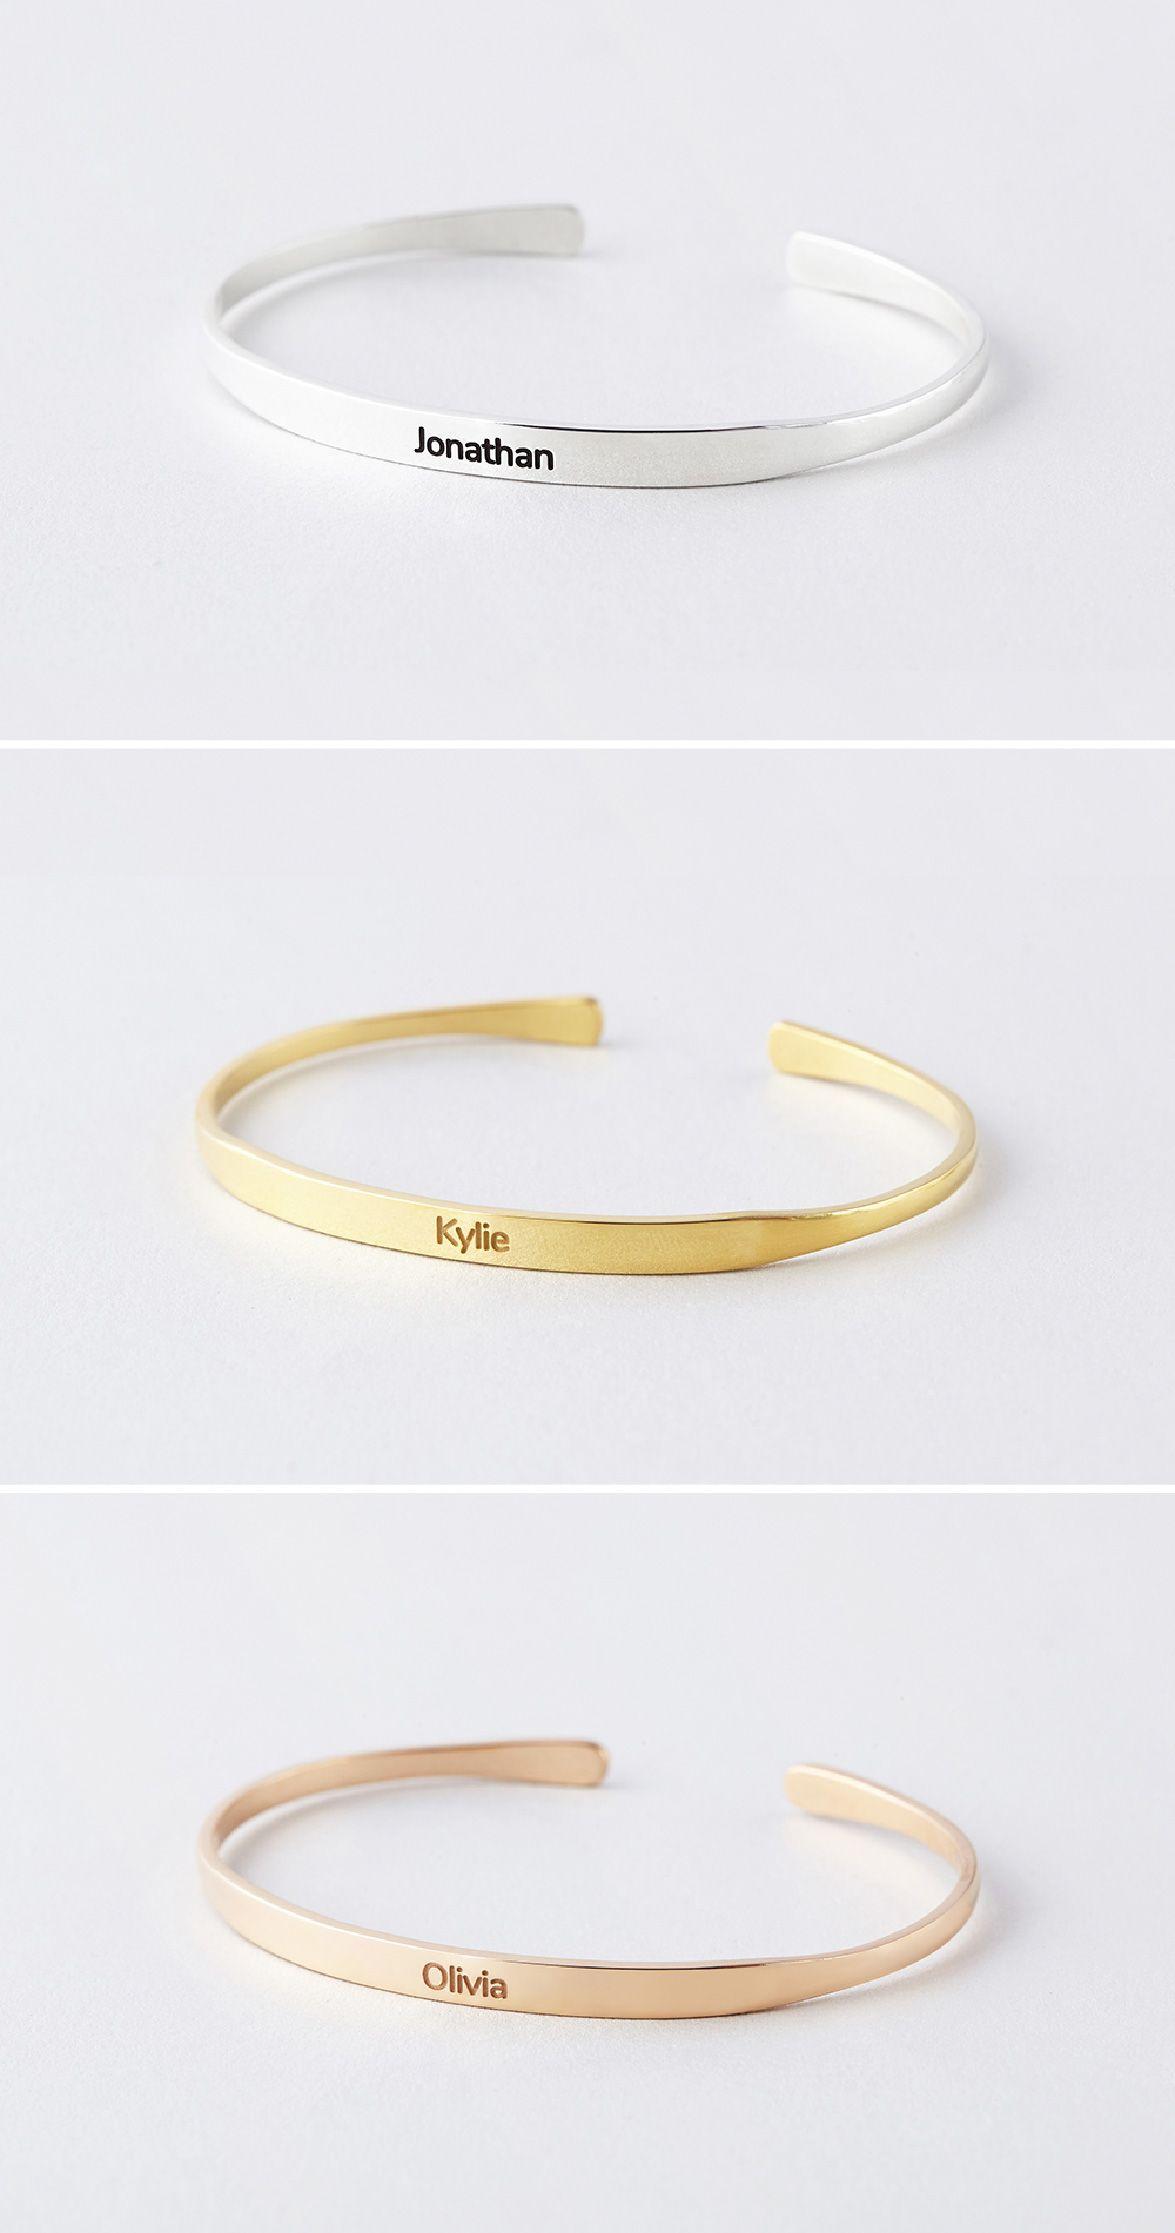 Name Bracelet With